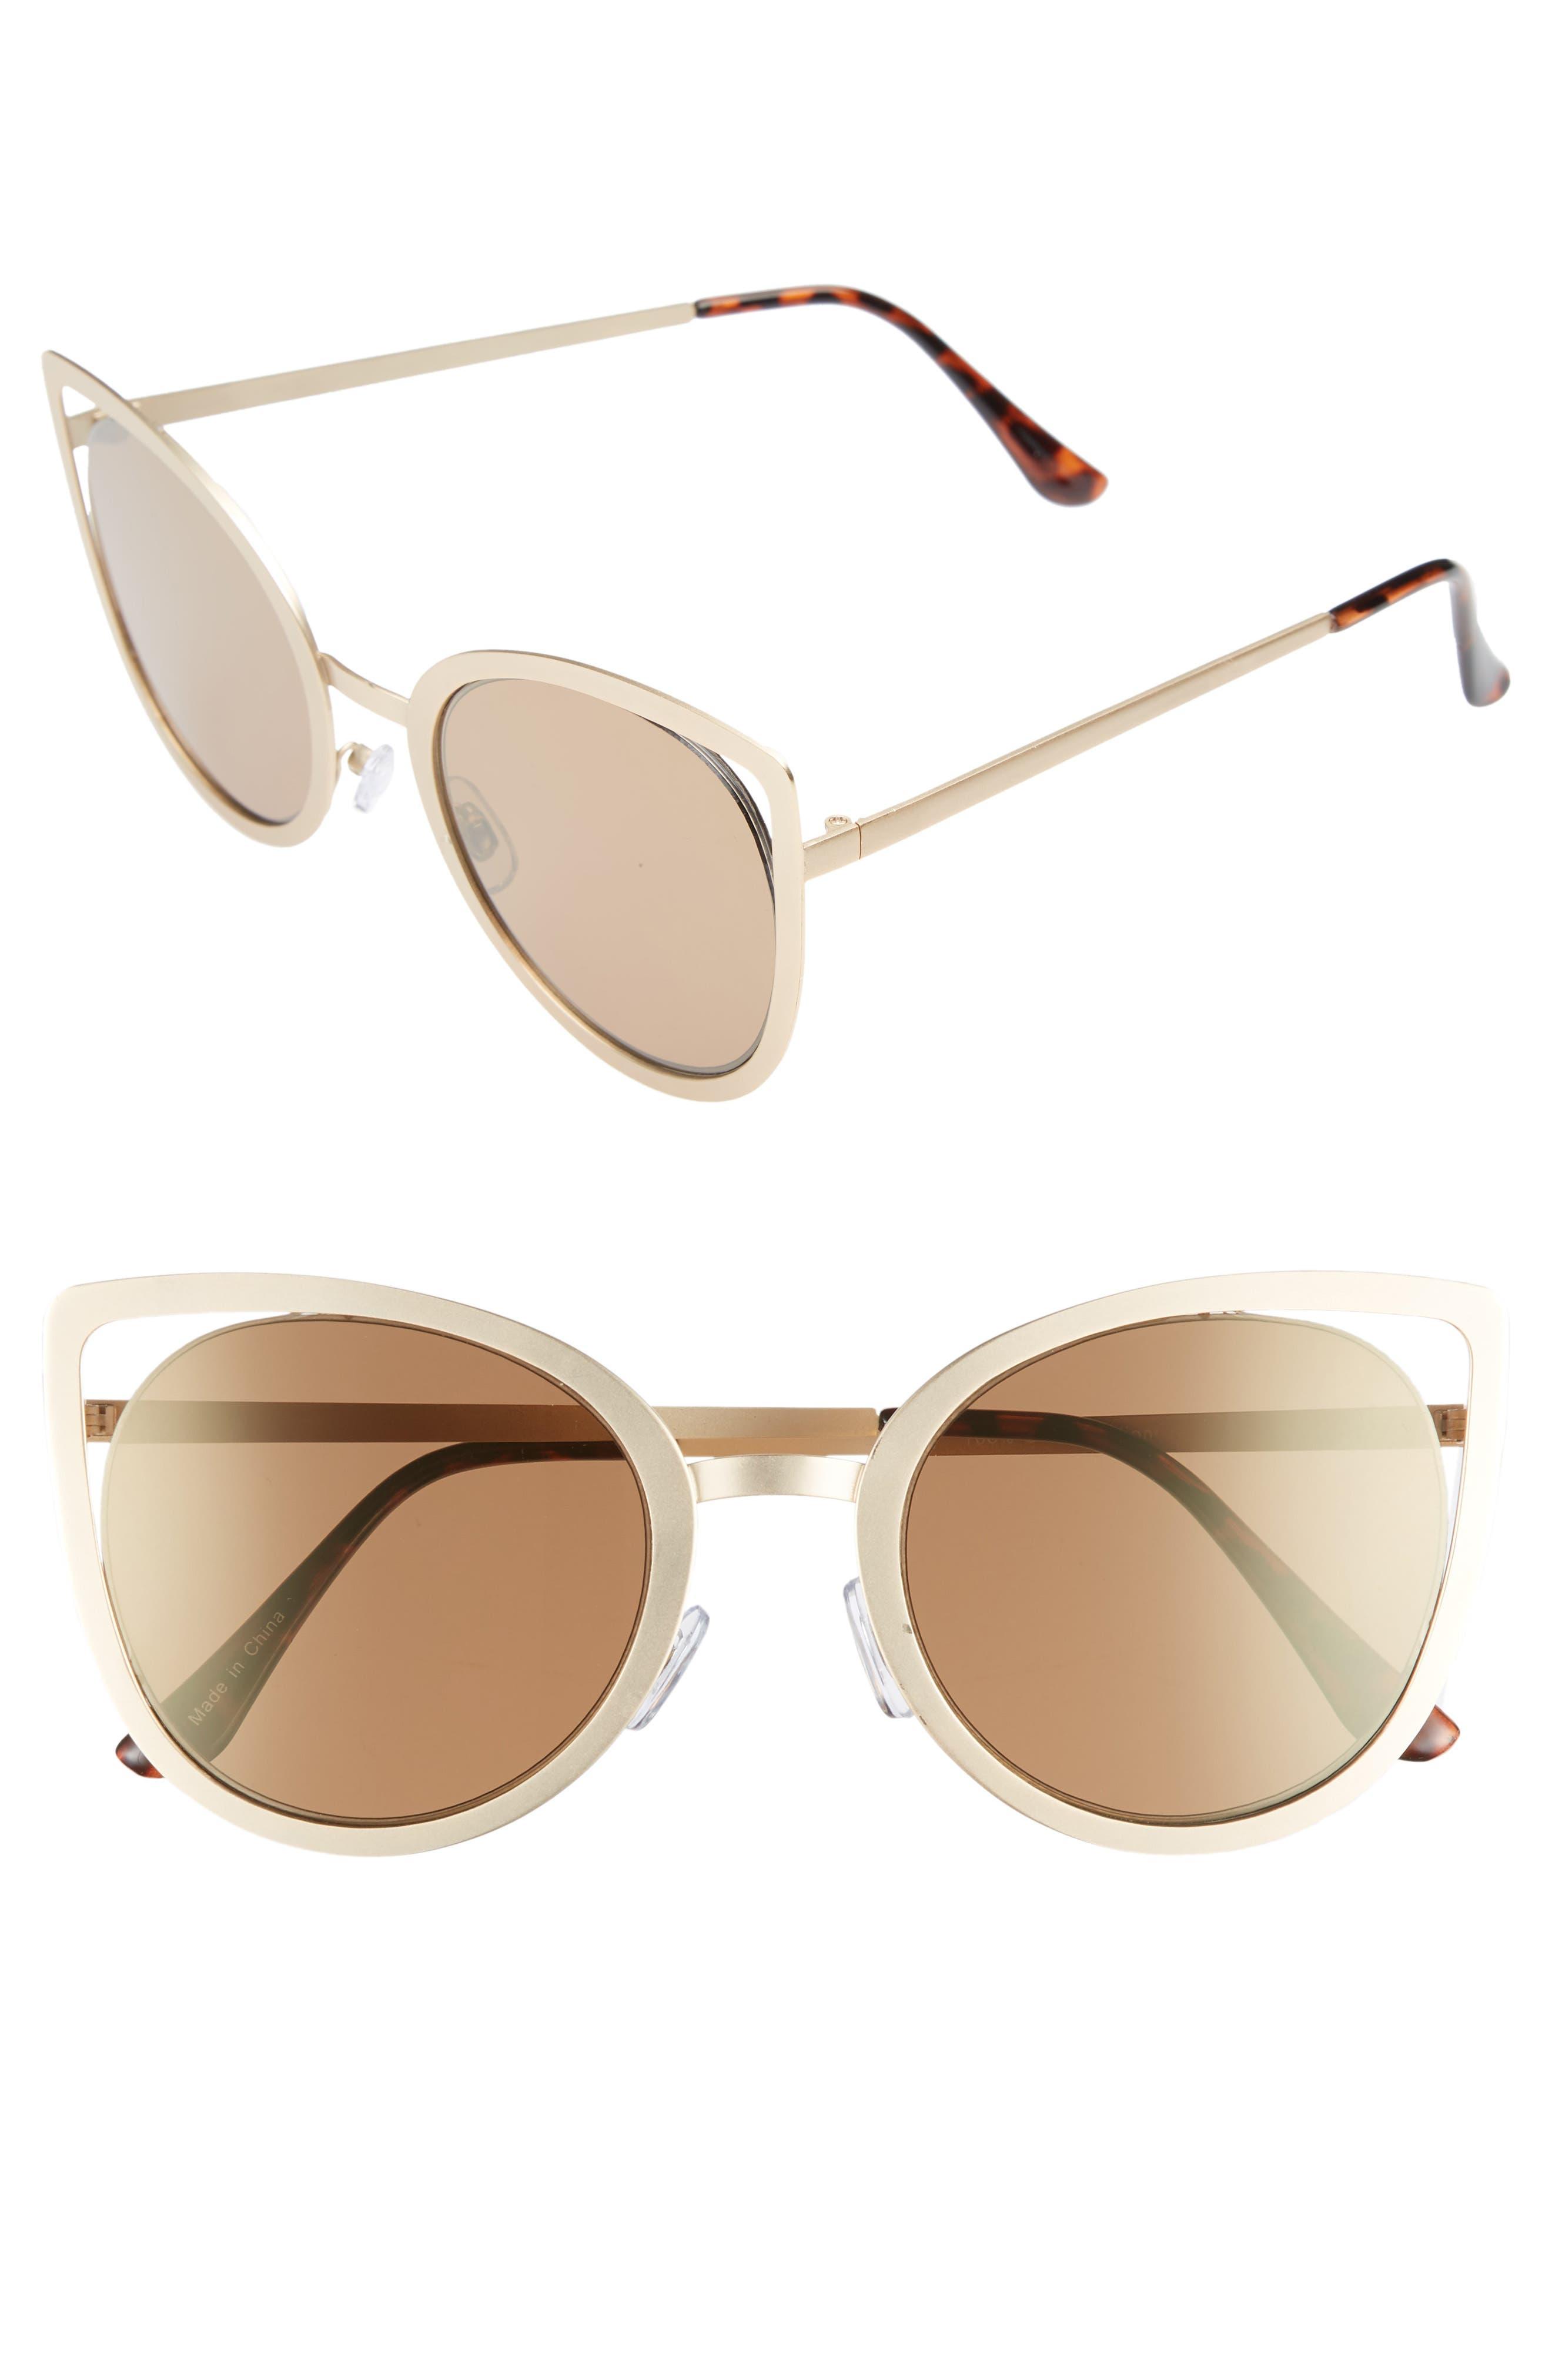 53mm Cutout Cat Eye Sunglasses,                             Main thumbnail 1, color,                             Gold